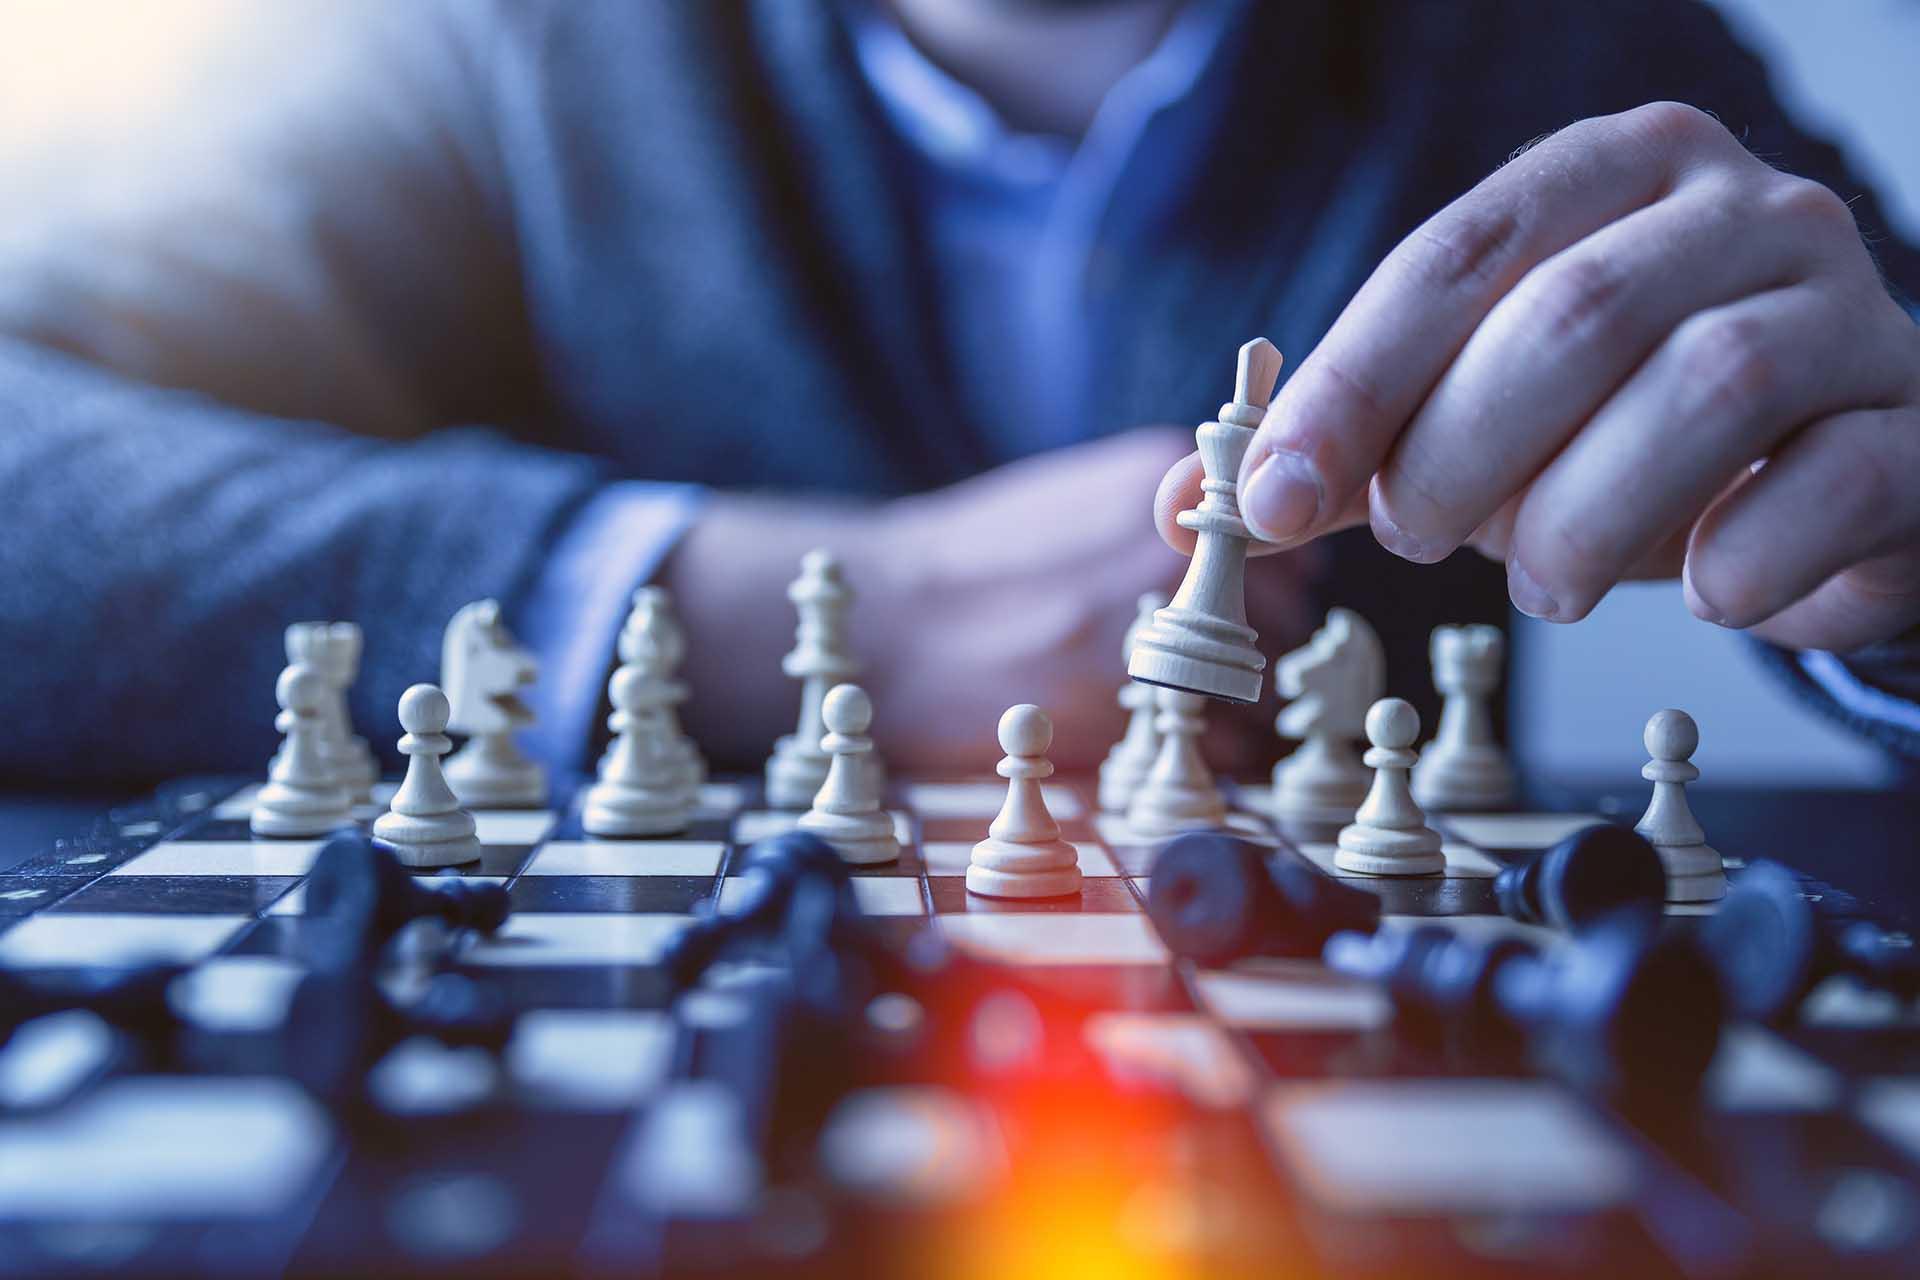 t2informatik Blog: The selection of management consultants